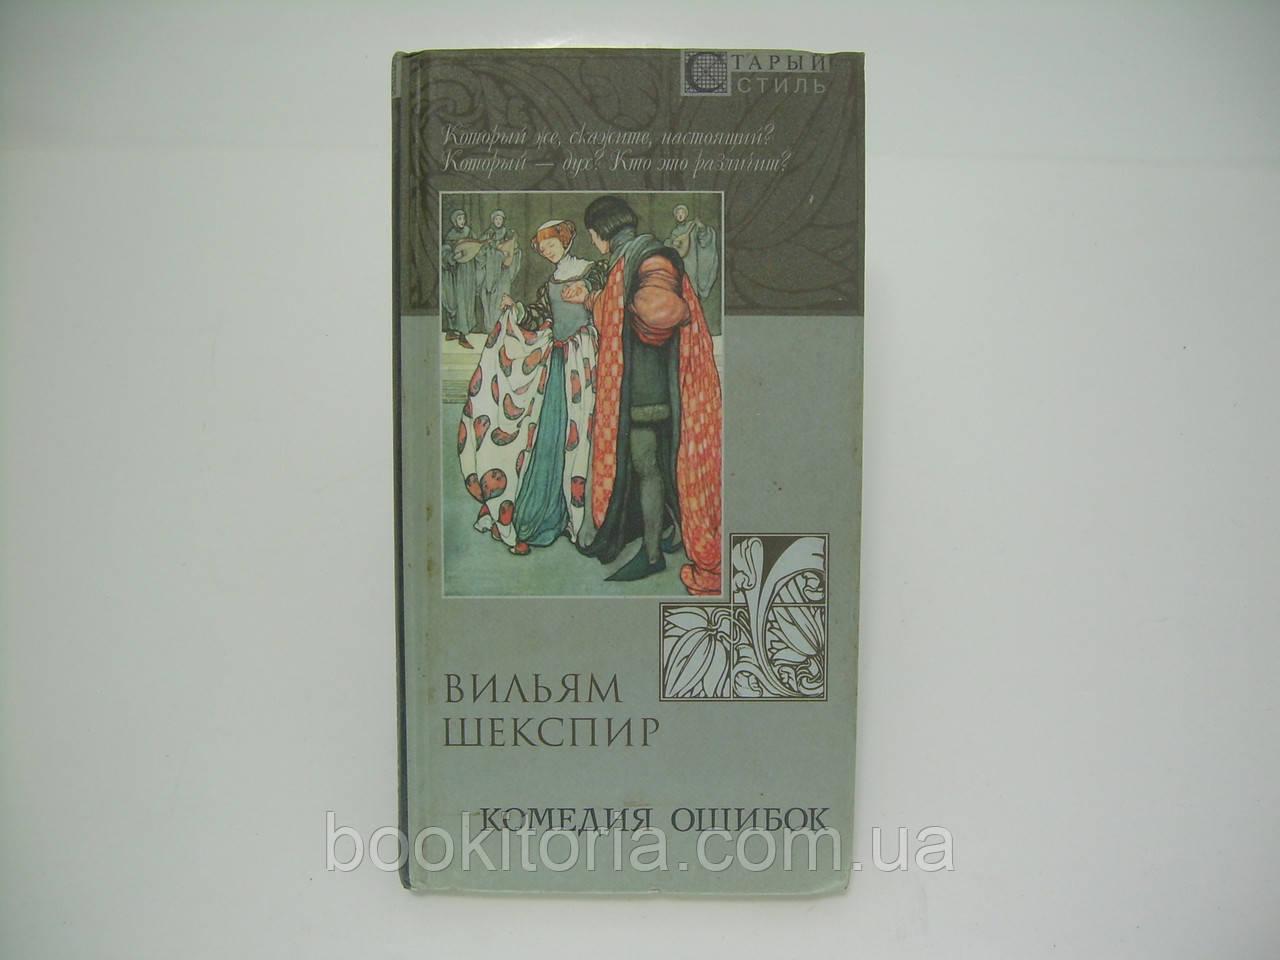 Шекспир В. Комедия ошибок (б/у).